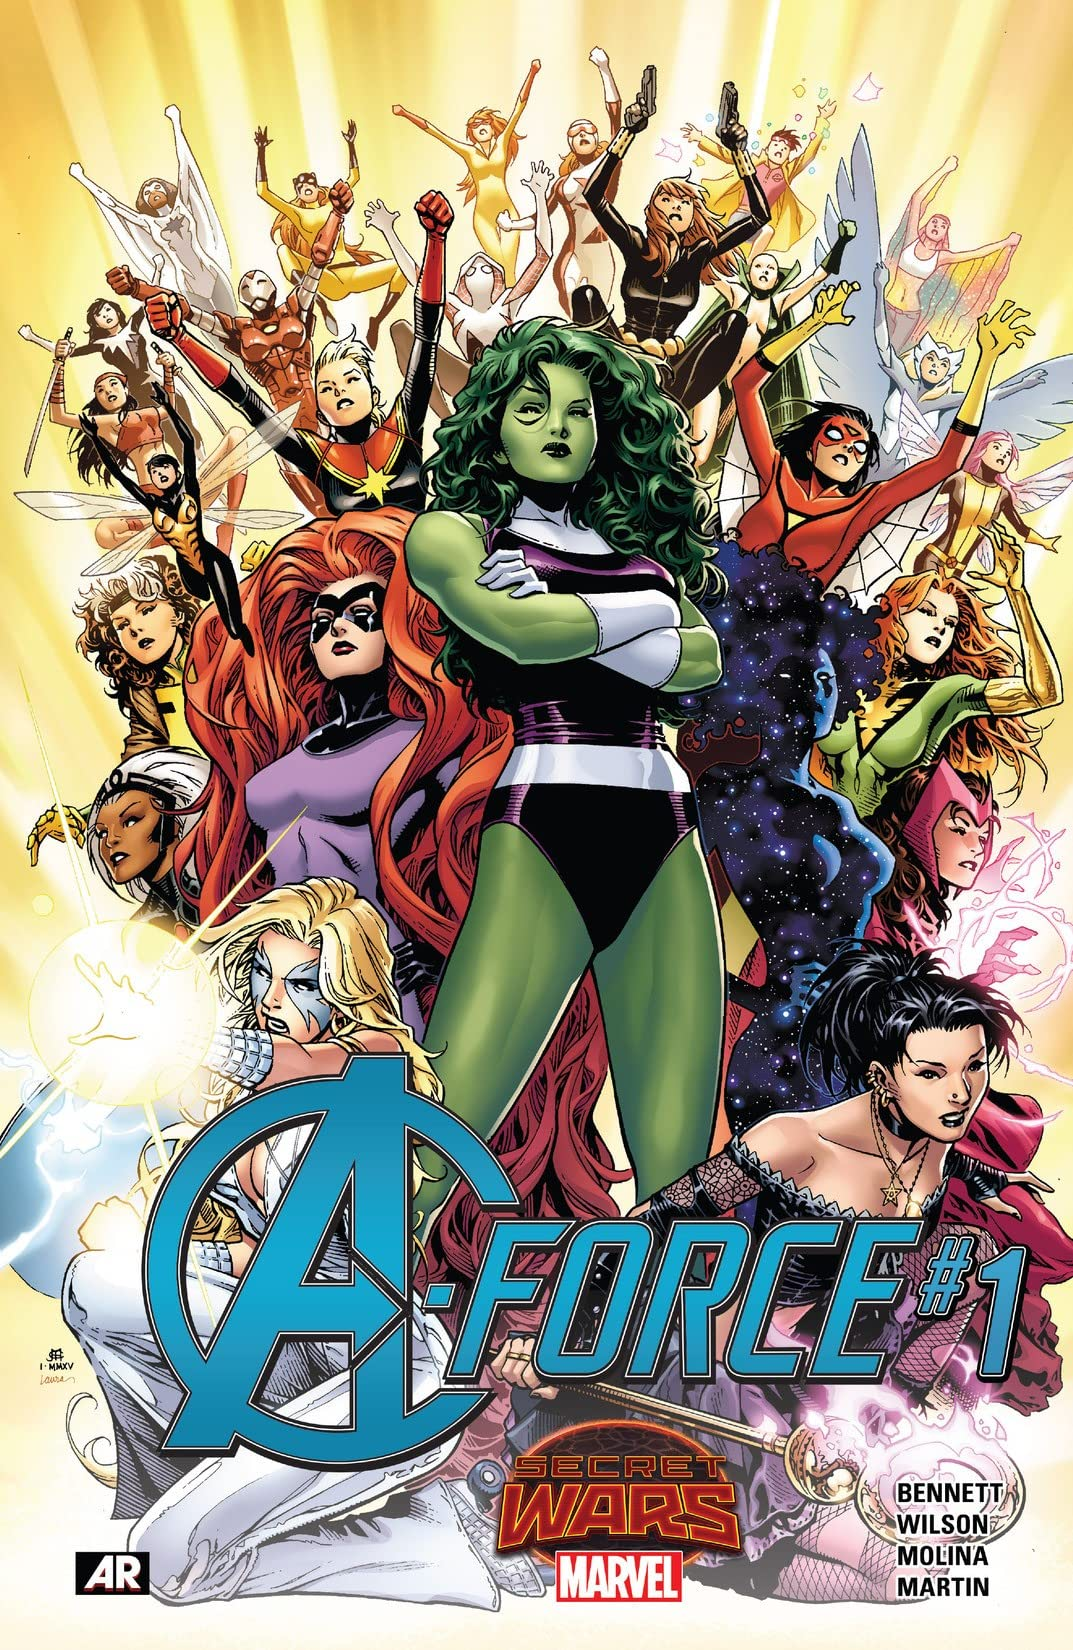 A-Force (2015) #1